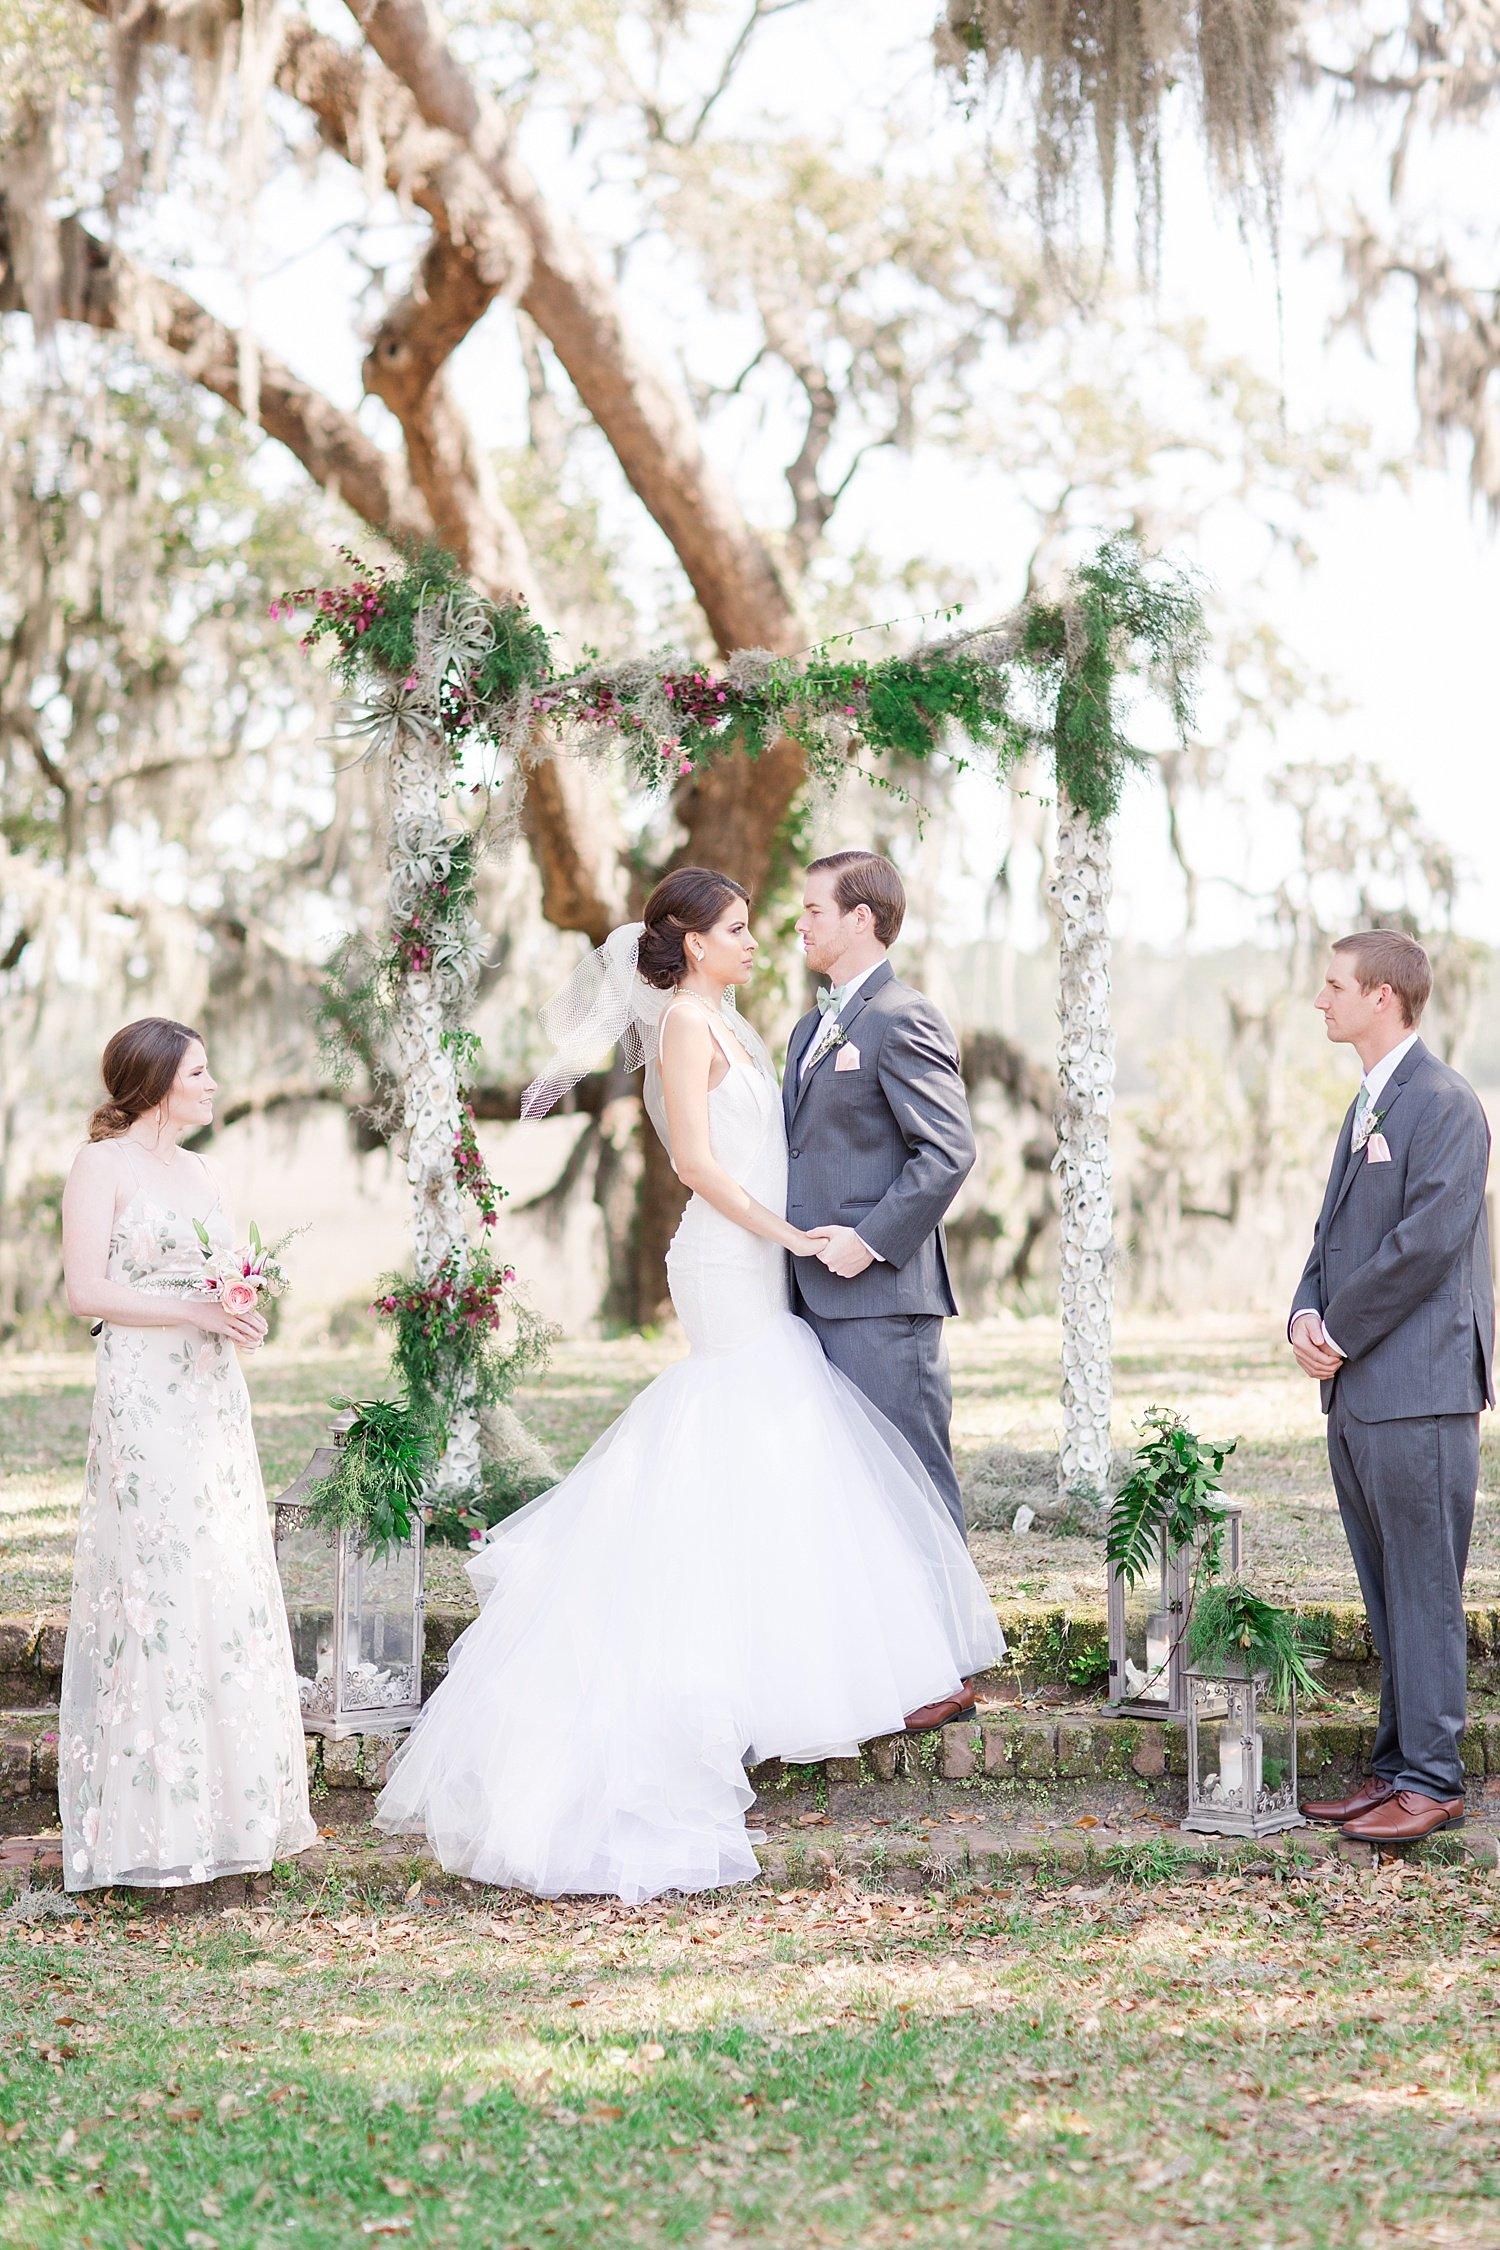 rachel-strickland-photography-katie-may-ivory-and-beau-bridal-boutique-bethesda-academy-wedding-whitfield-chapel-wedding-savannah-bridal-boutique-savannah-weddings-savannah-wedding-savannah-wedding-planner-savannah-bridal-gowns-savannah-bride-11.jpg